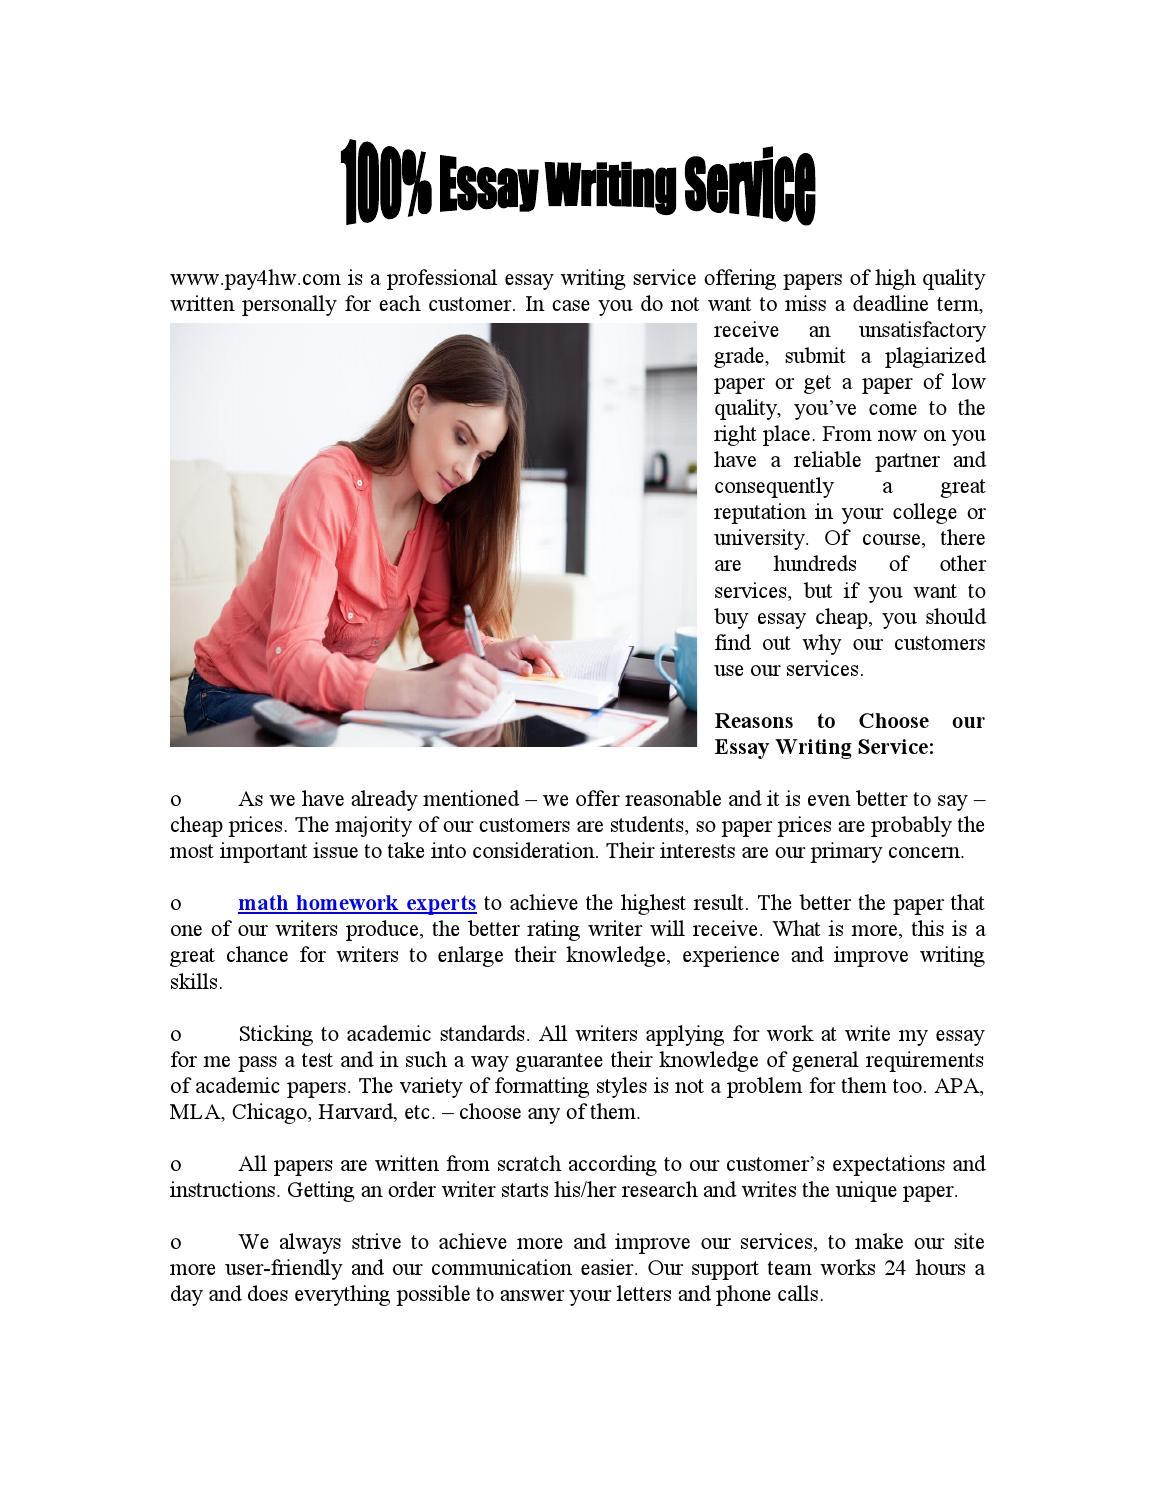 Esl scholarship essay writer services